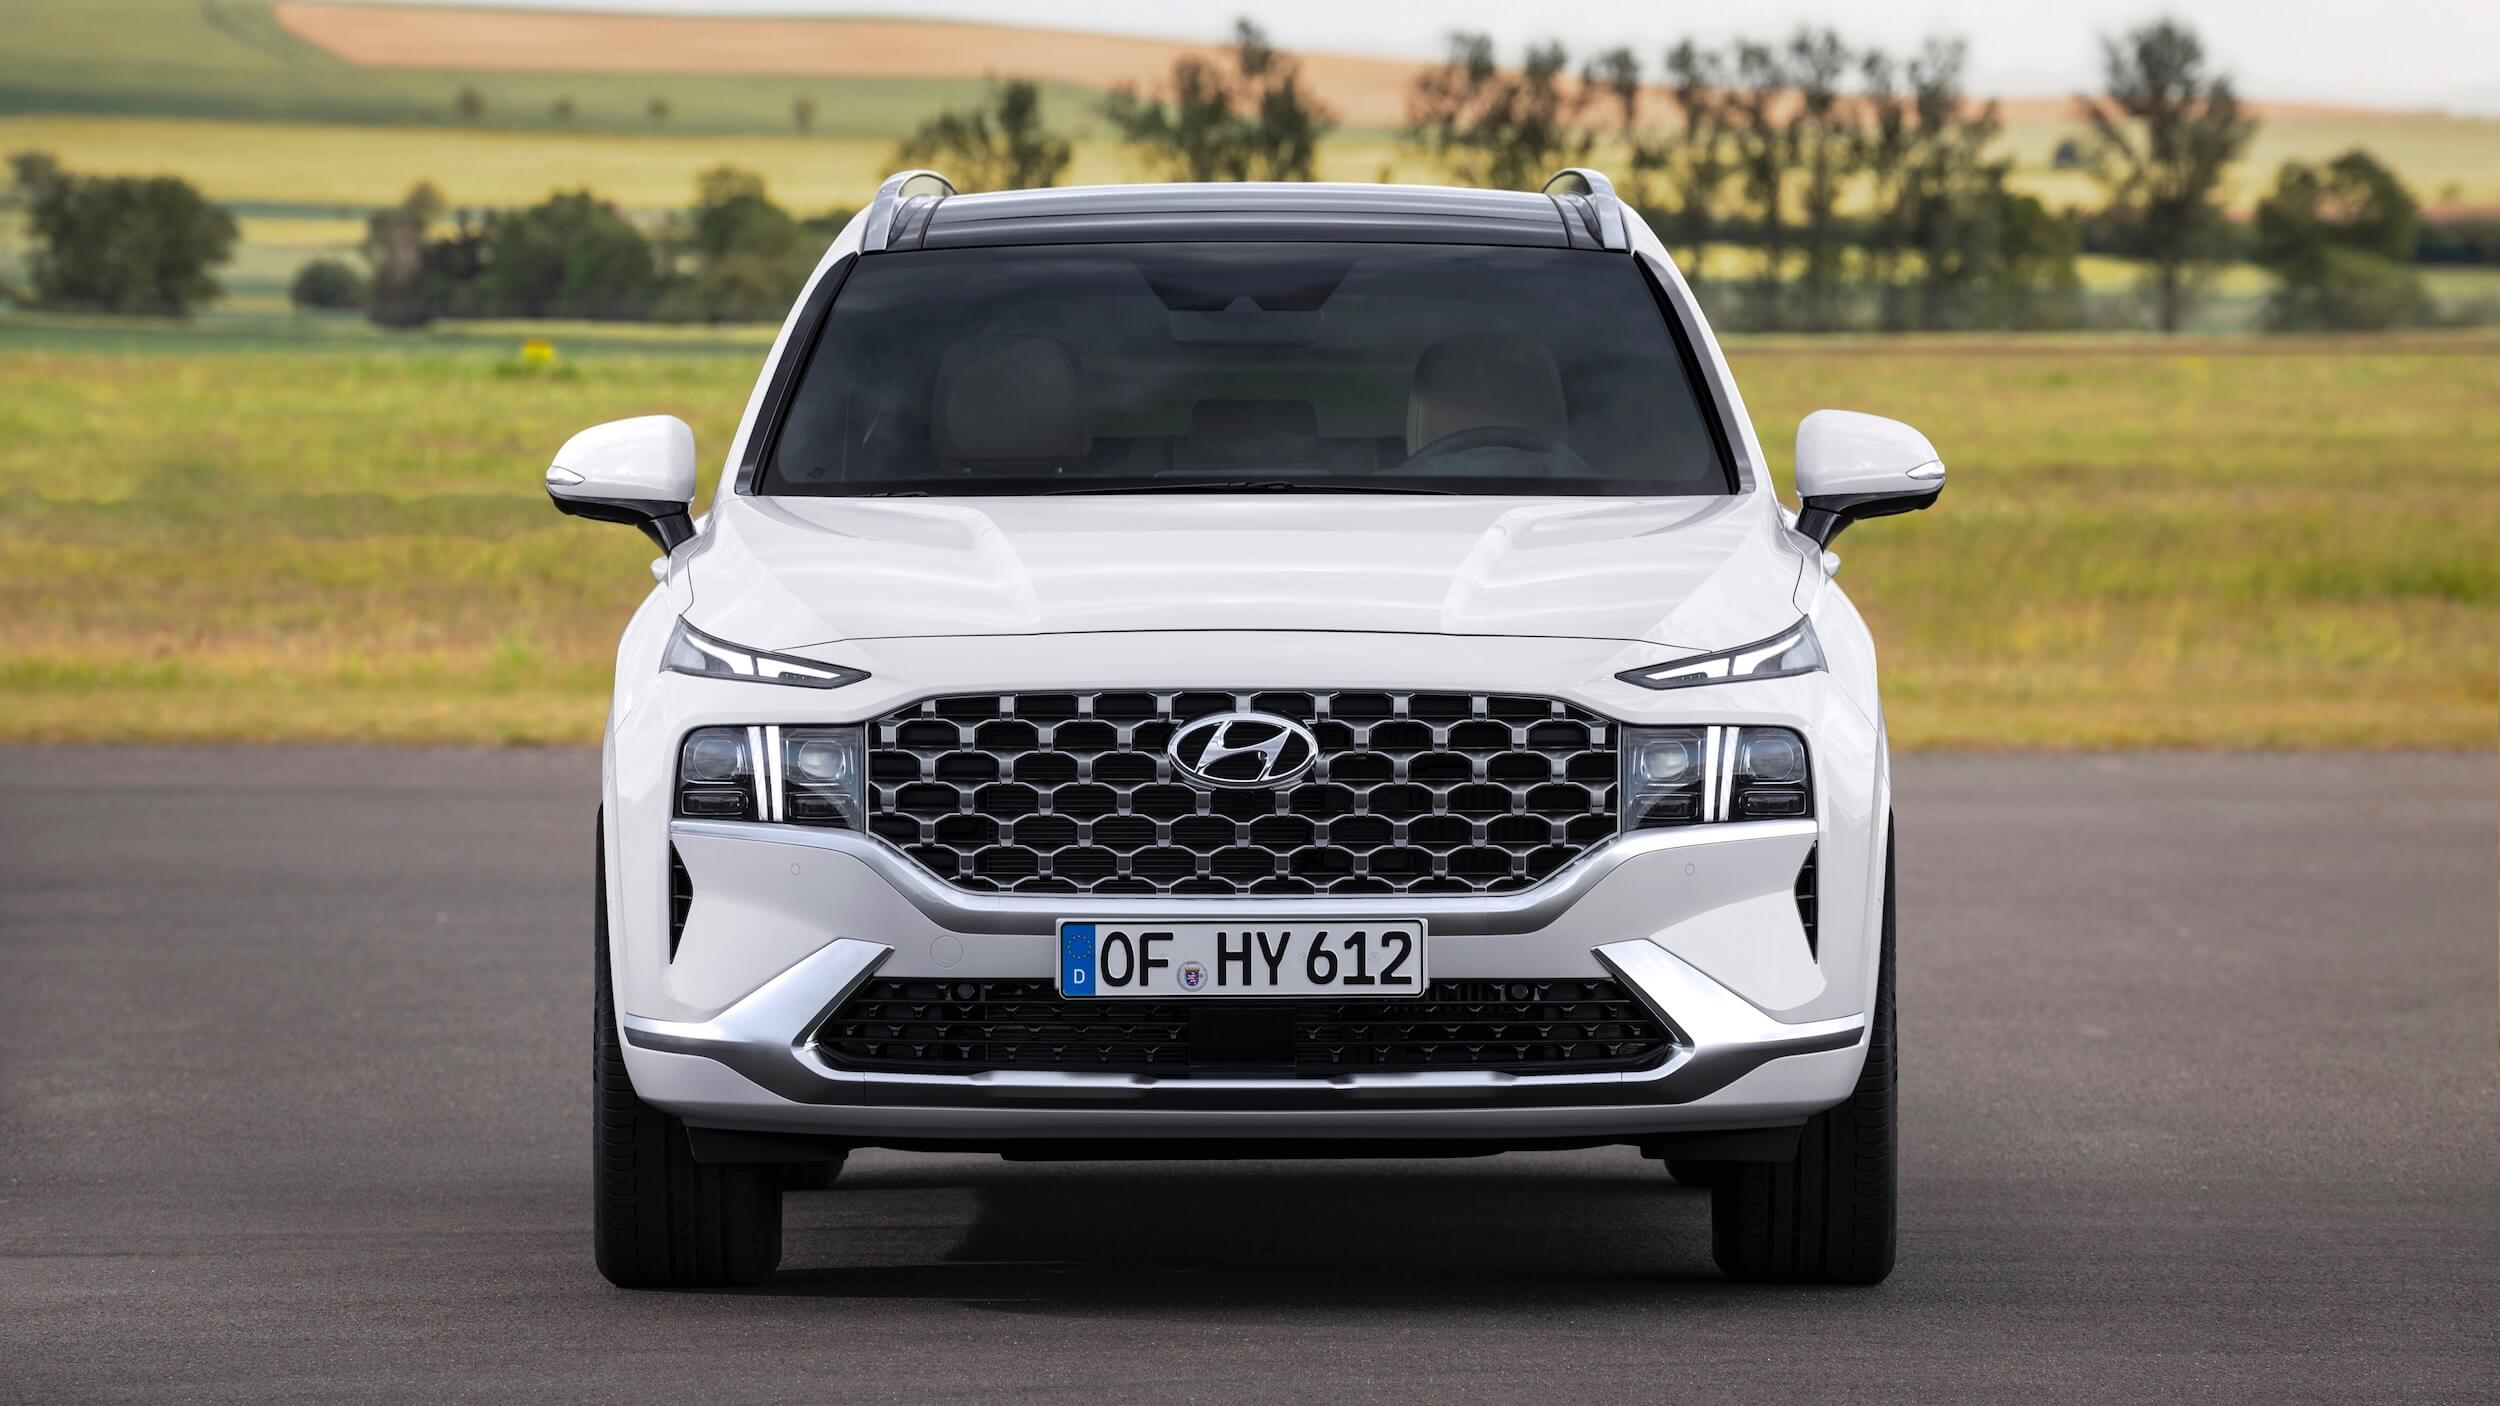 Hyundai Santa Fe hybrid voorkant